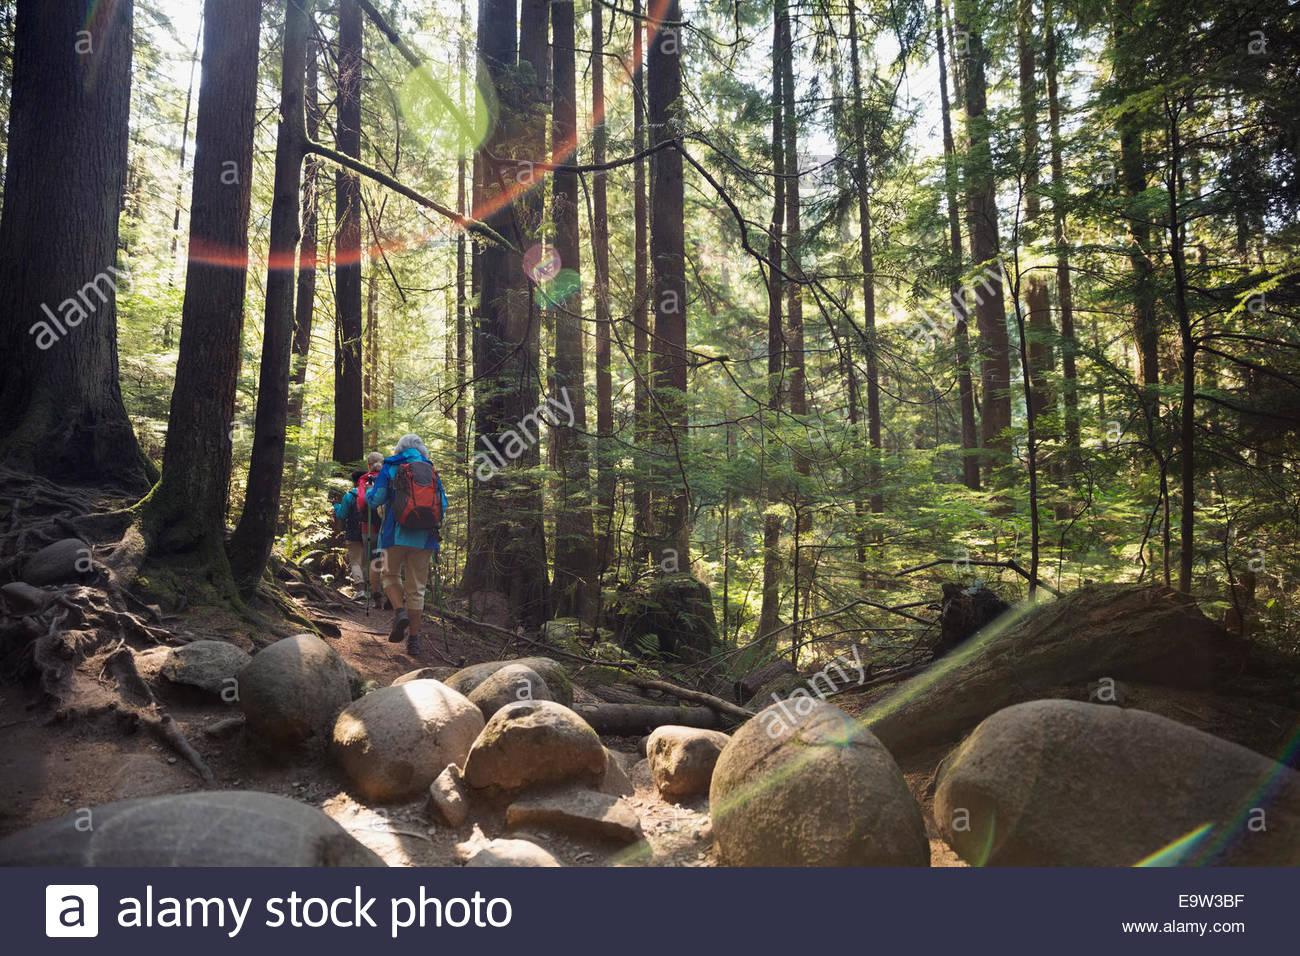 Women hiking below trees in sunny woods - Stock Image